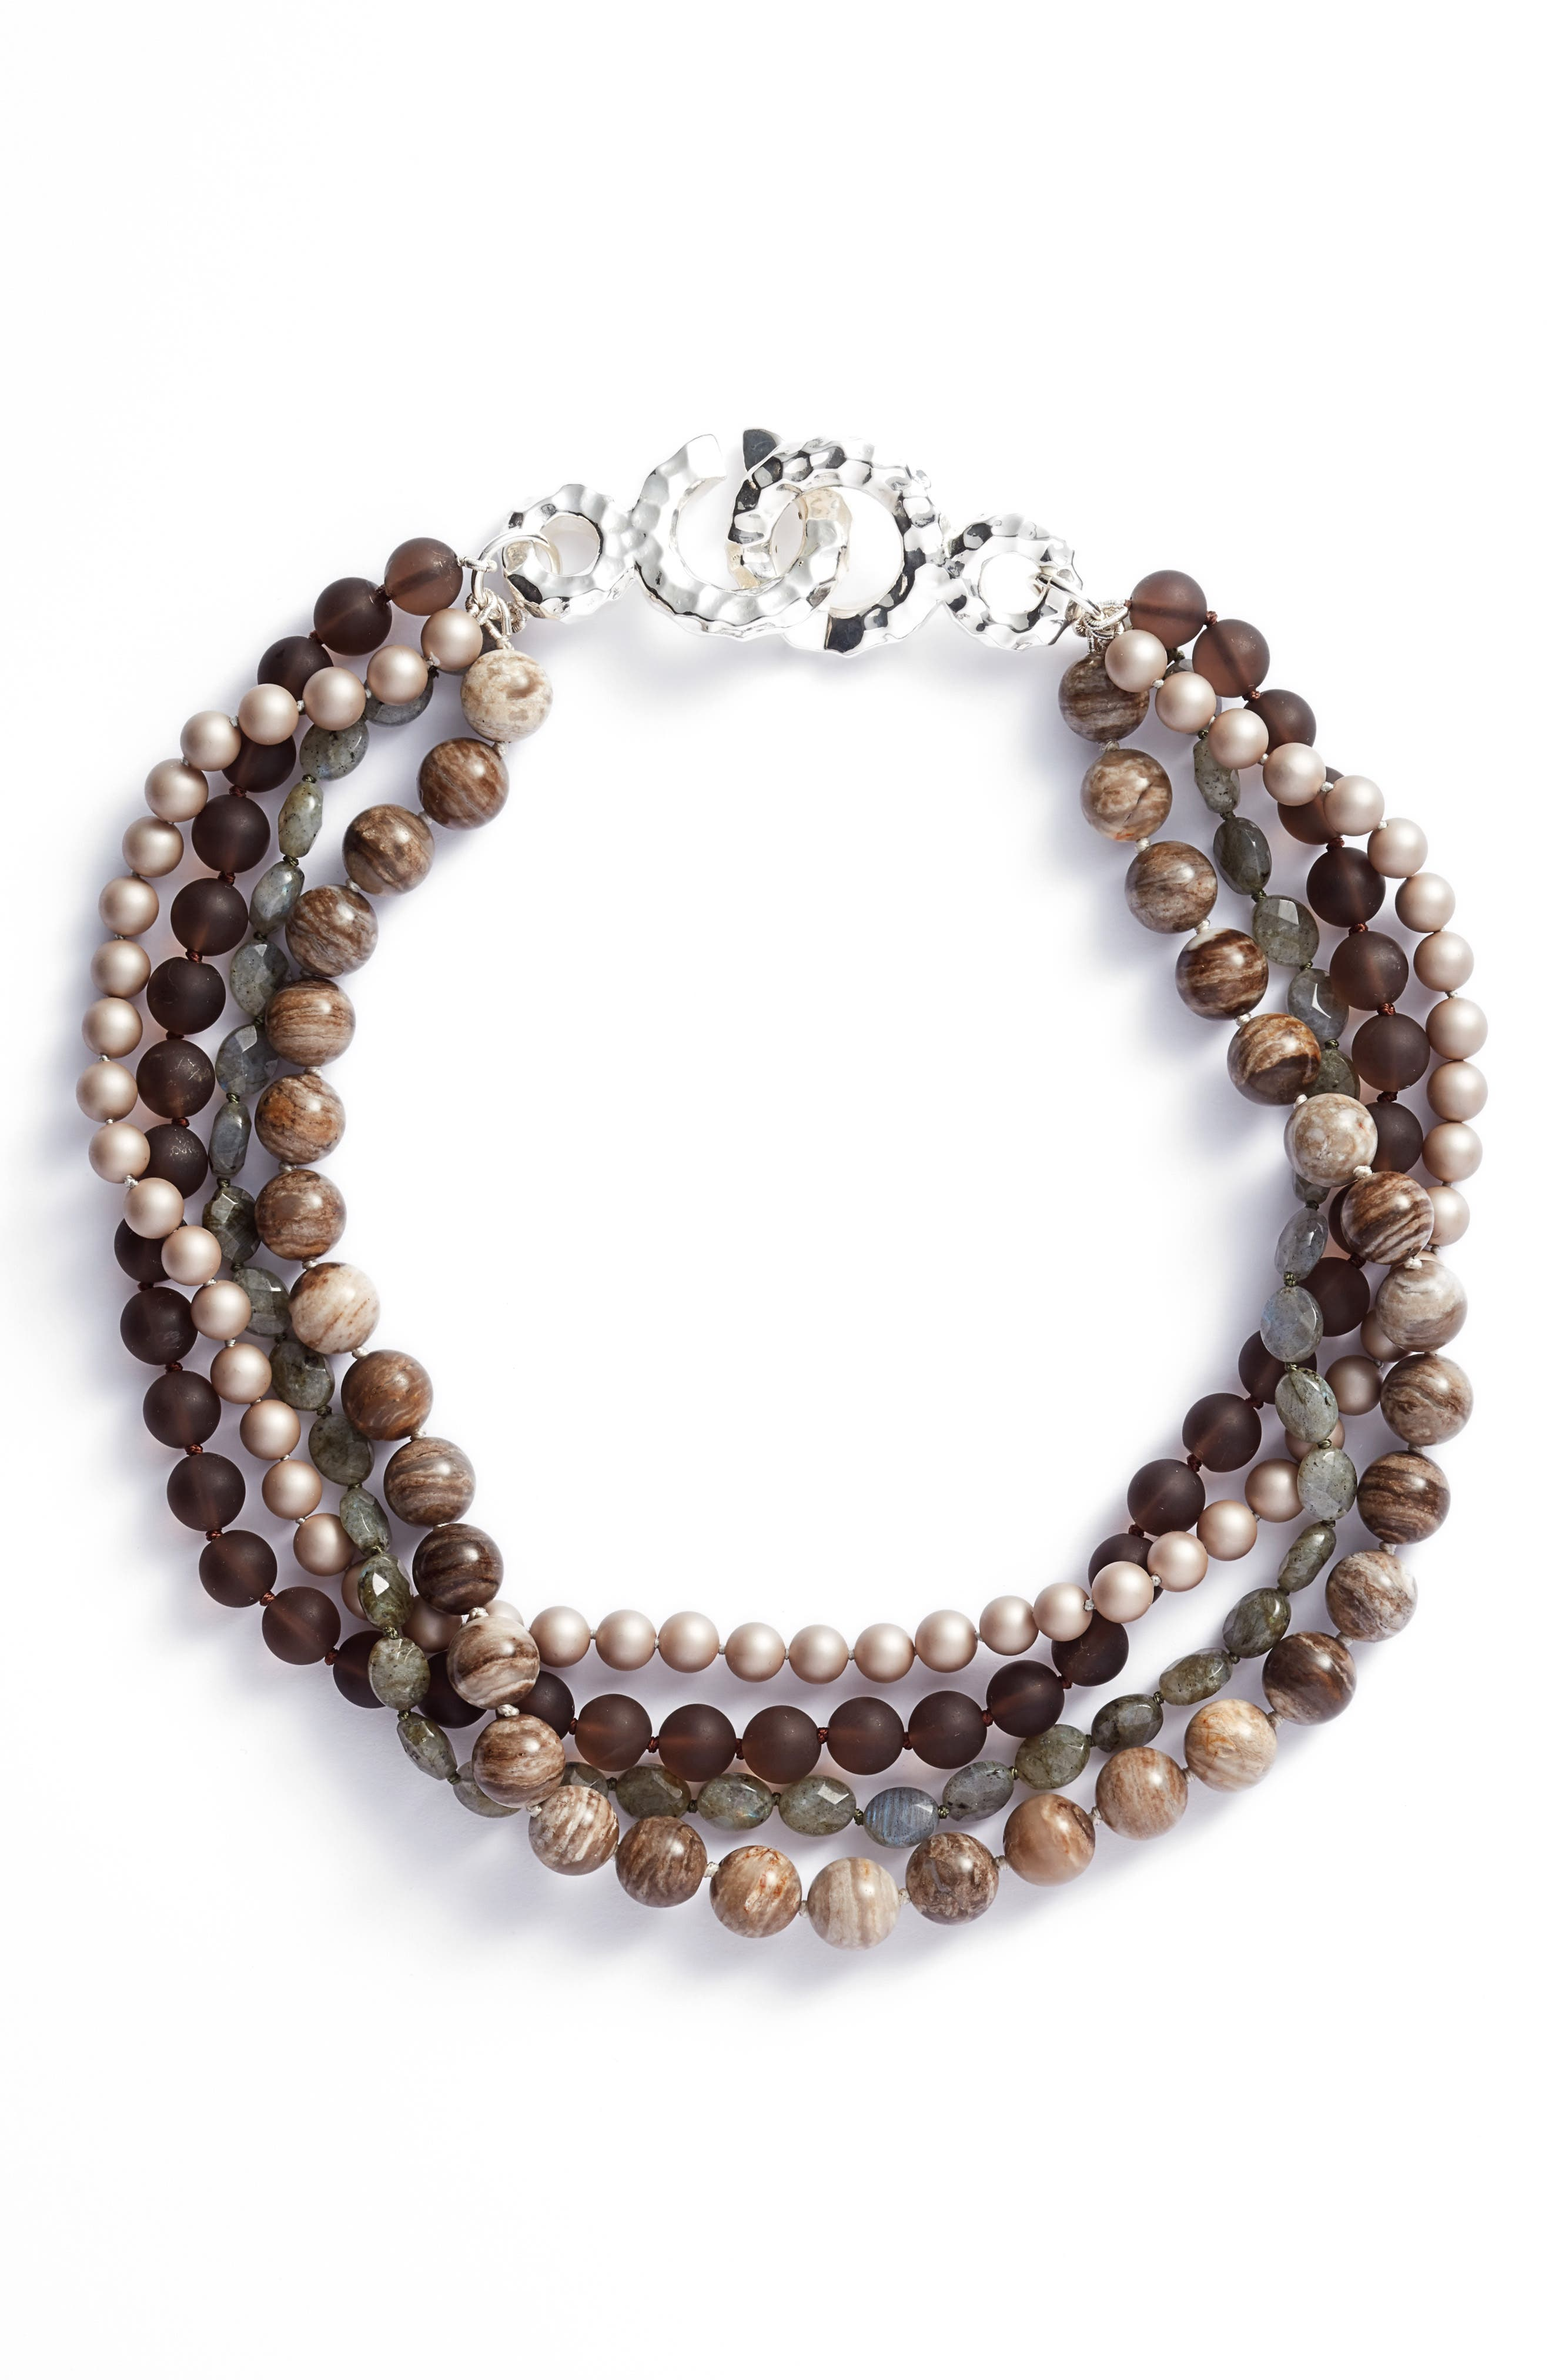 Simone Sebbag Multistrand Beaded Necklace,                         Main,                         color, Multi